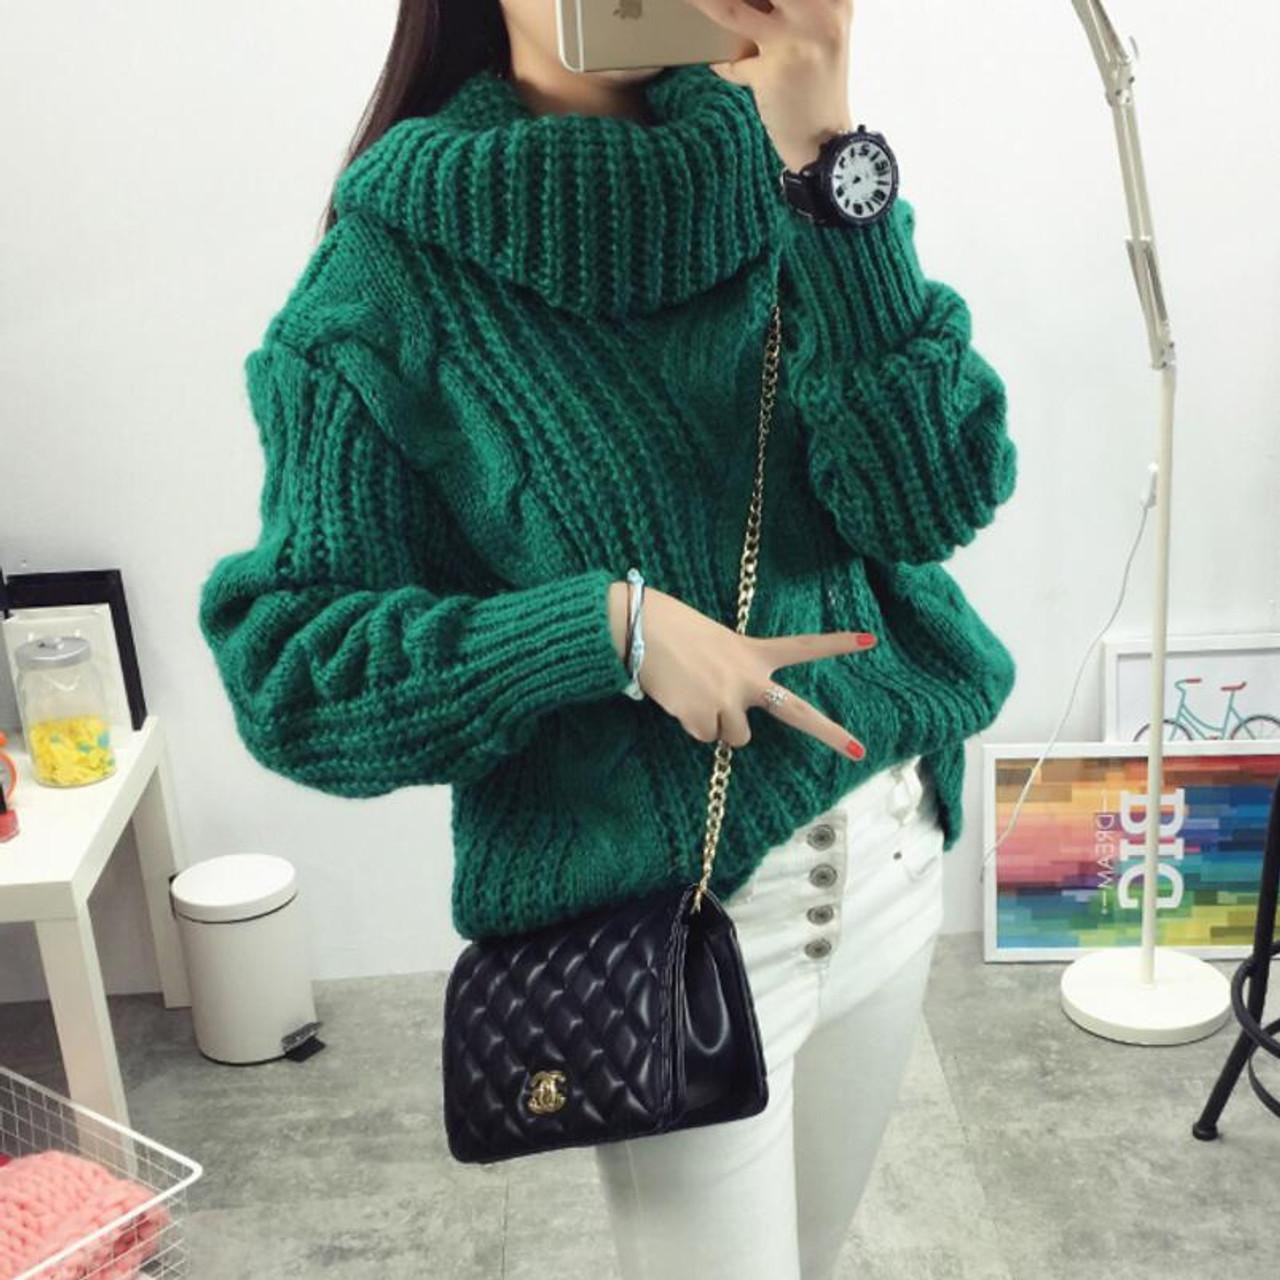 736a6c83ea Vintage Turtleneck Sweater Winter Oversize Twist Hemp Flowers High Neck  Loose Pullovers Women Thicken Knitted Warm Sweater - OnshopDeals.Com